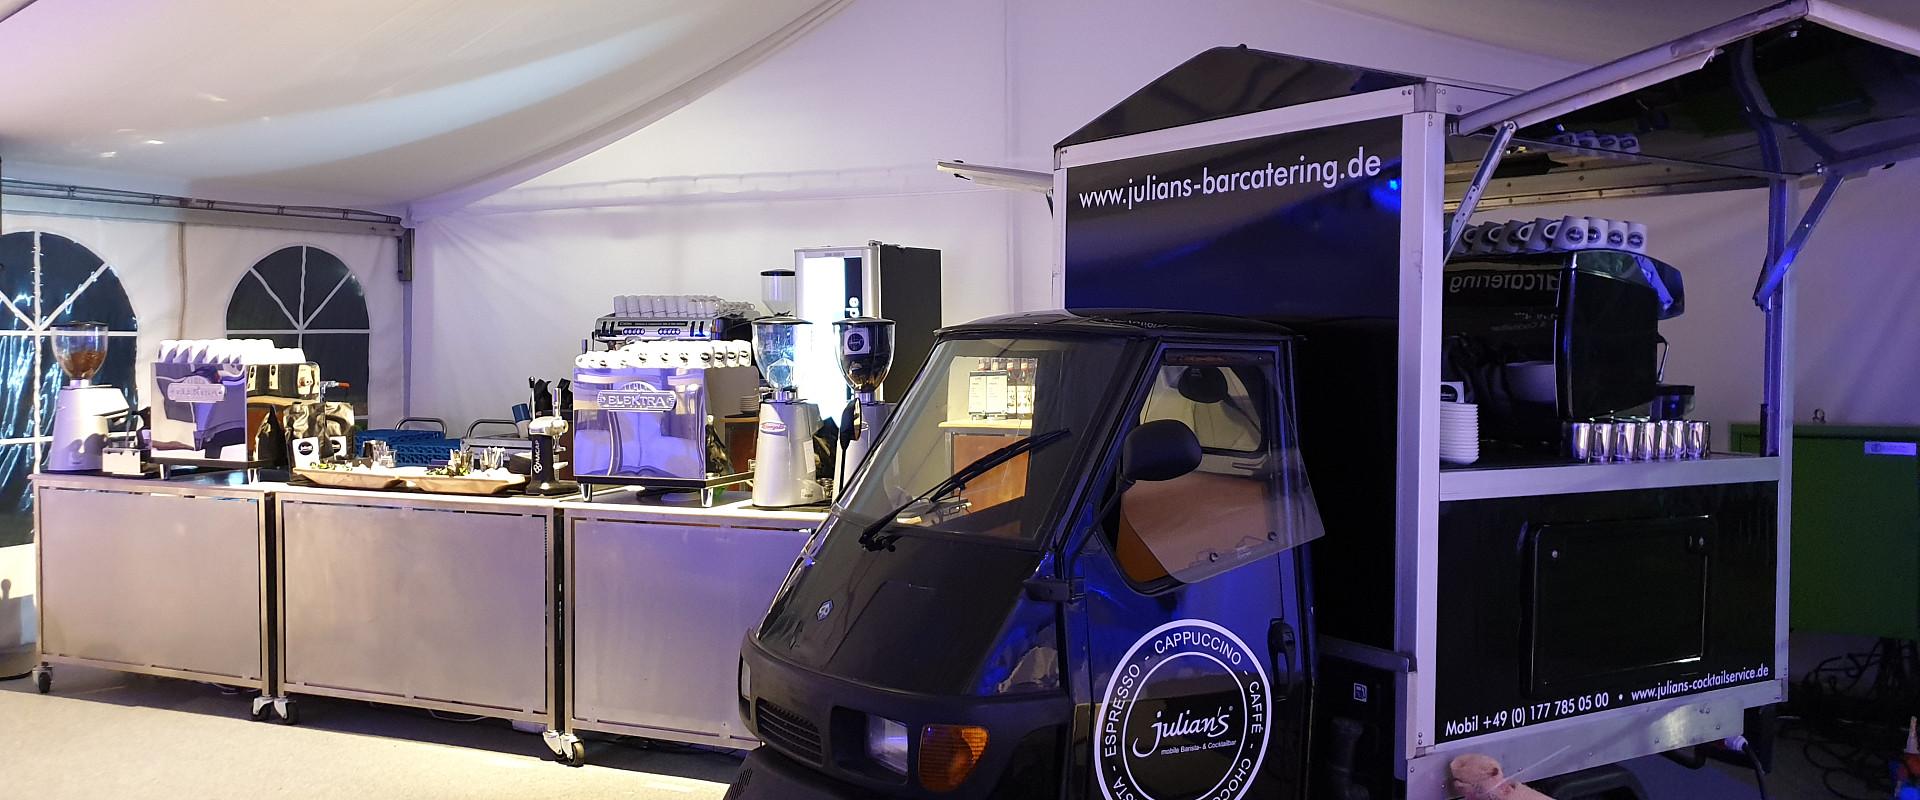 Julians Ape Kaffee Mobil